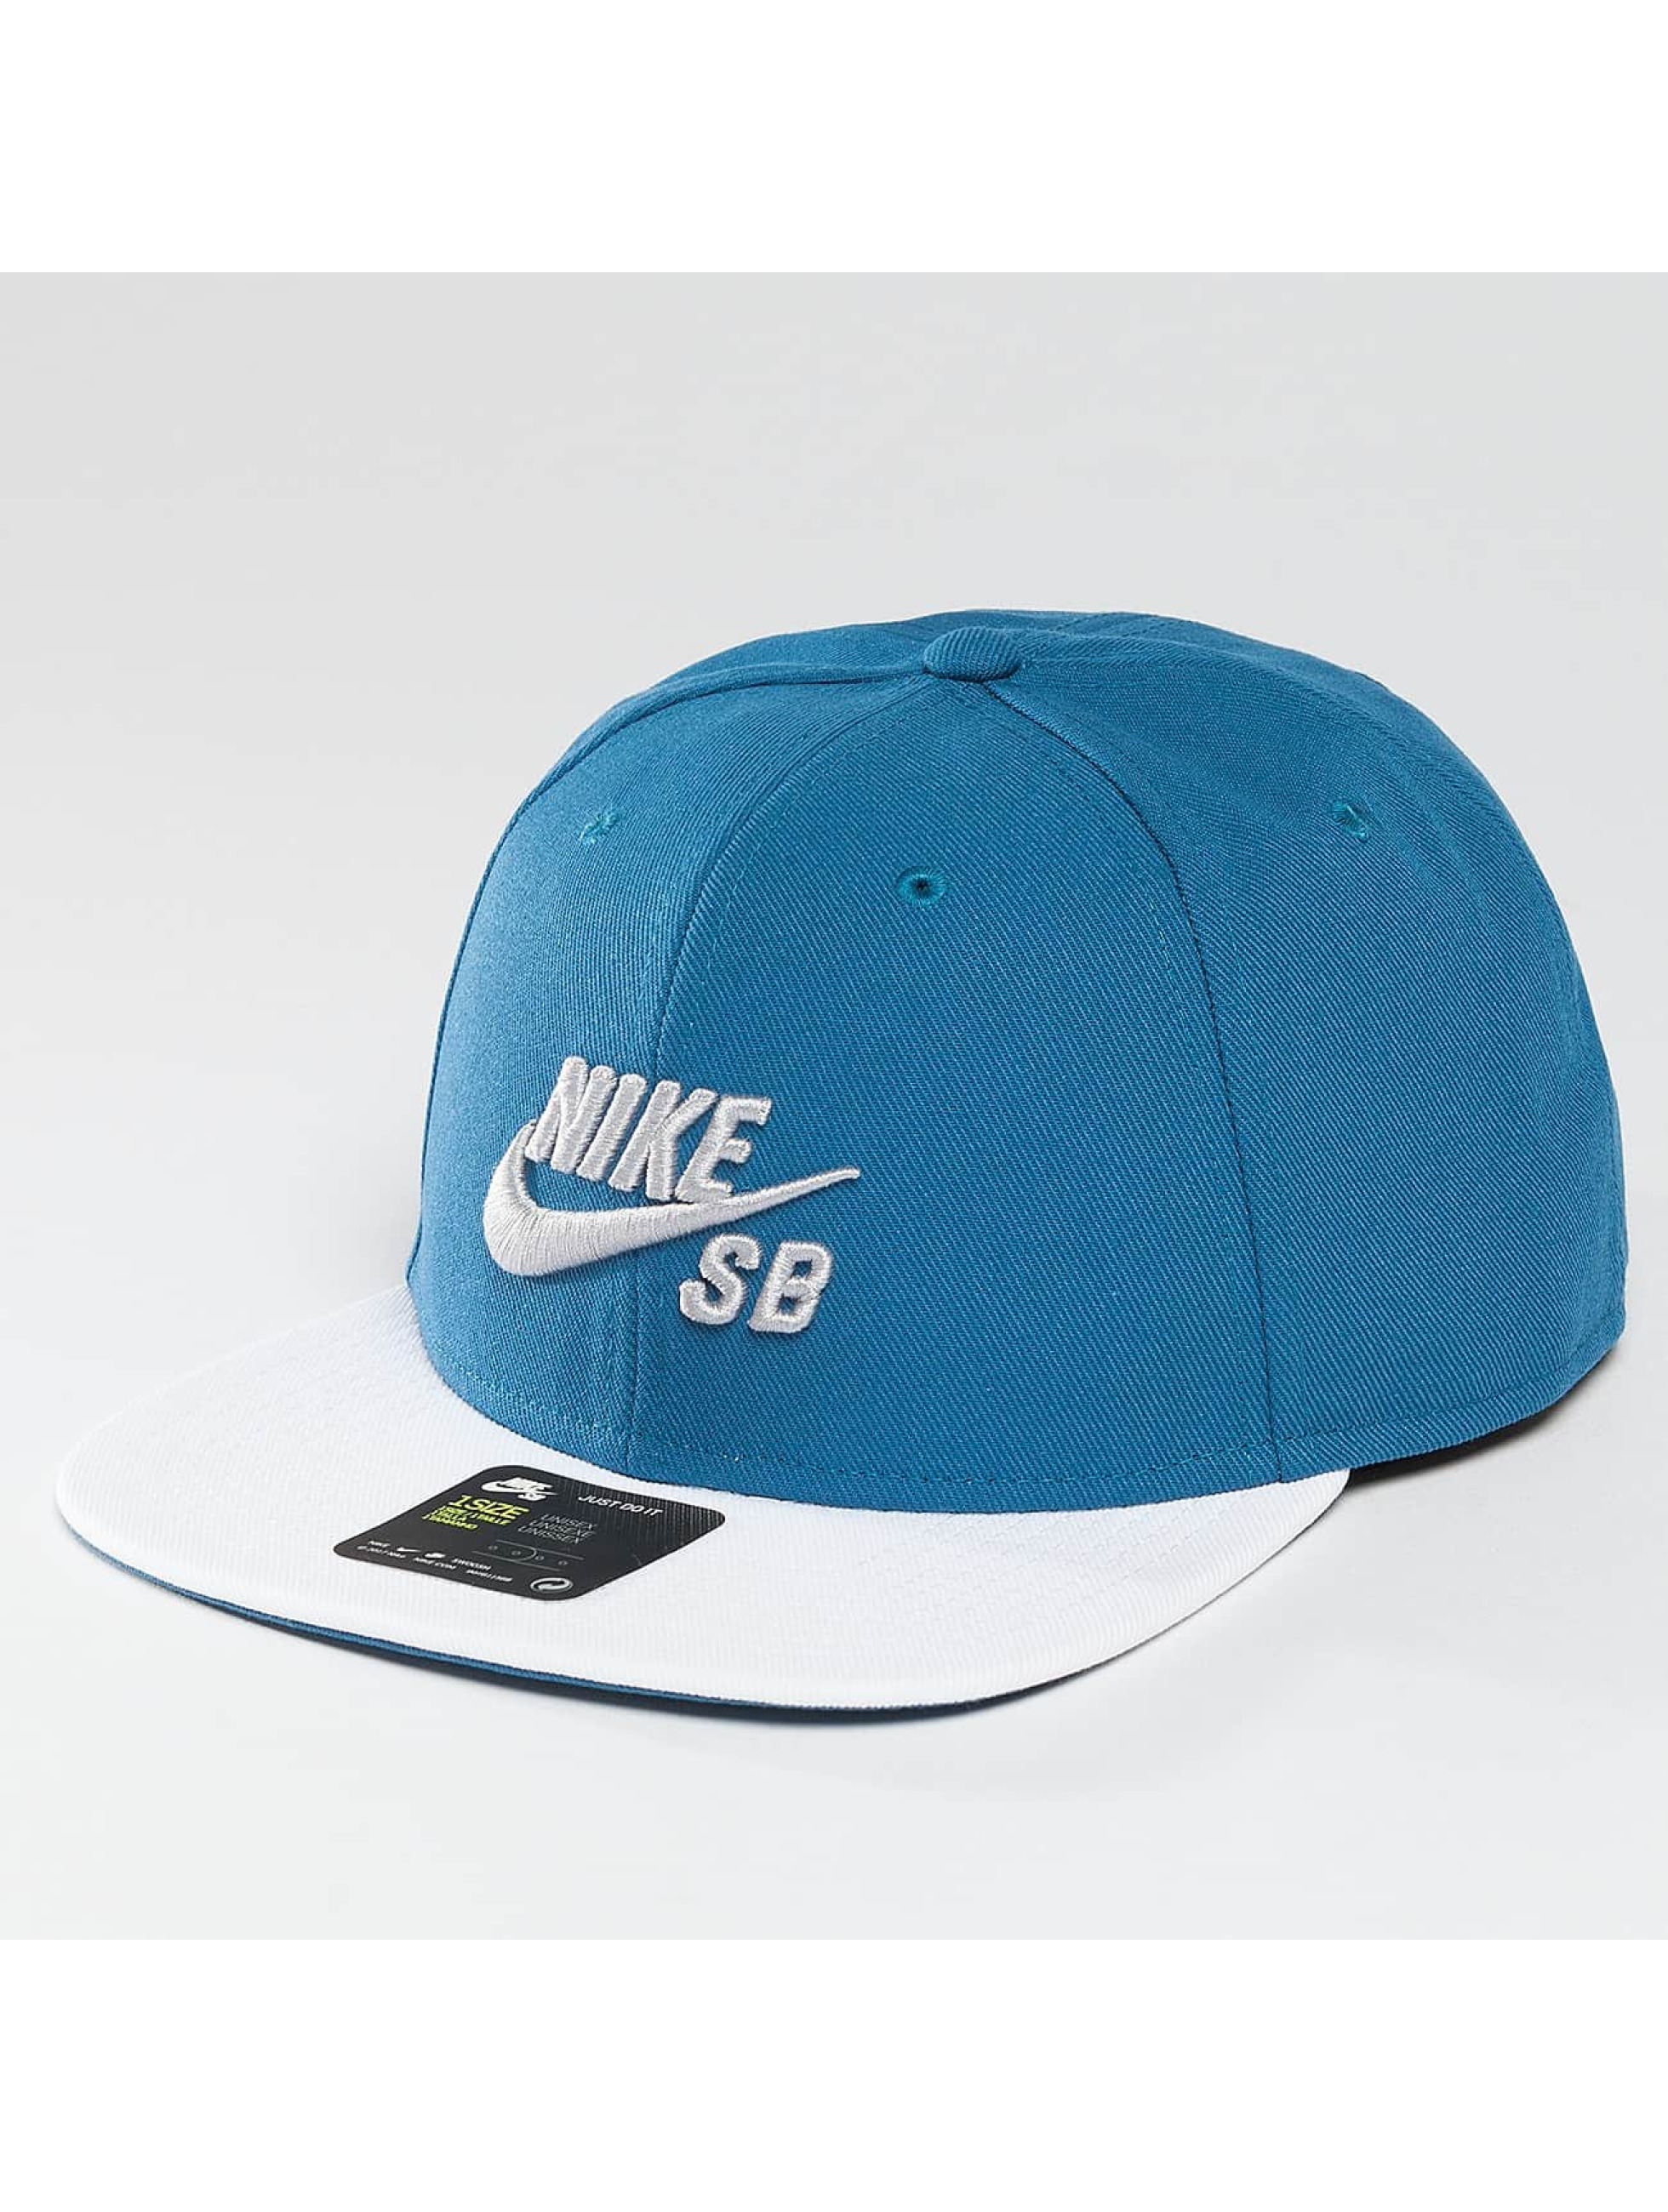 australia nike snapback blue icon 33d04 ba954 3fd5ec802a79